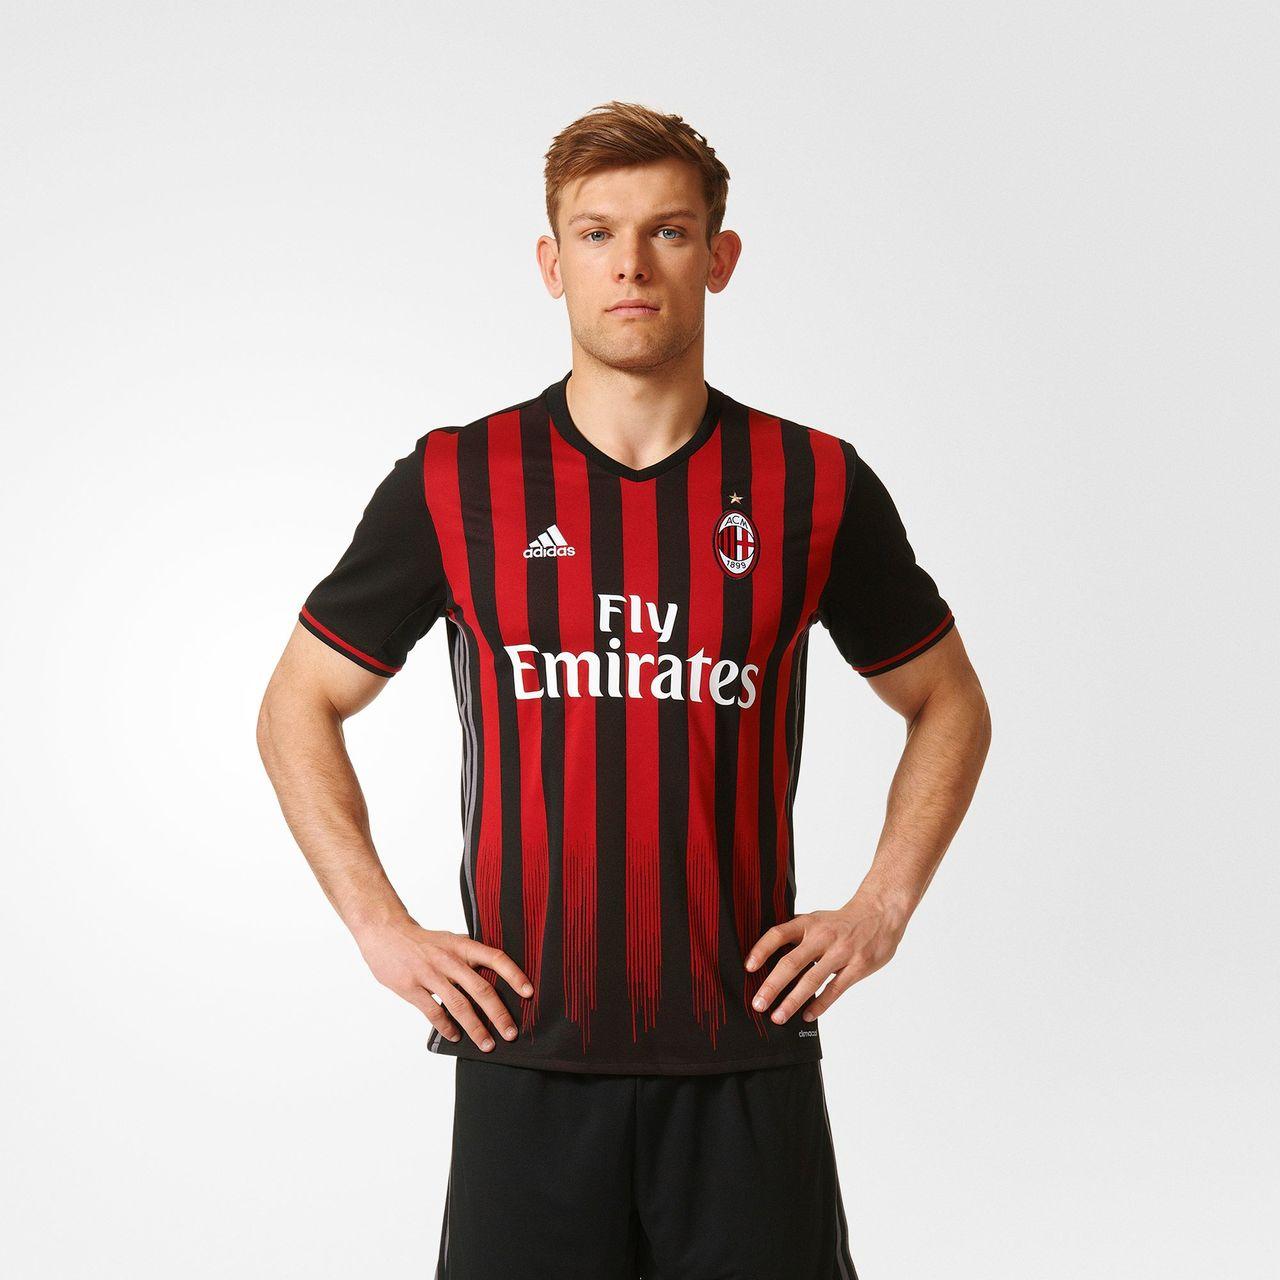 Camiseta del Milan 2016/2017 (ADIDAS).